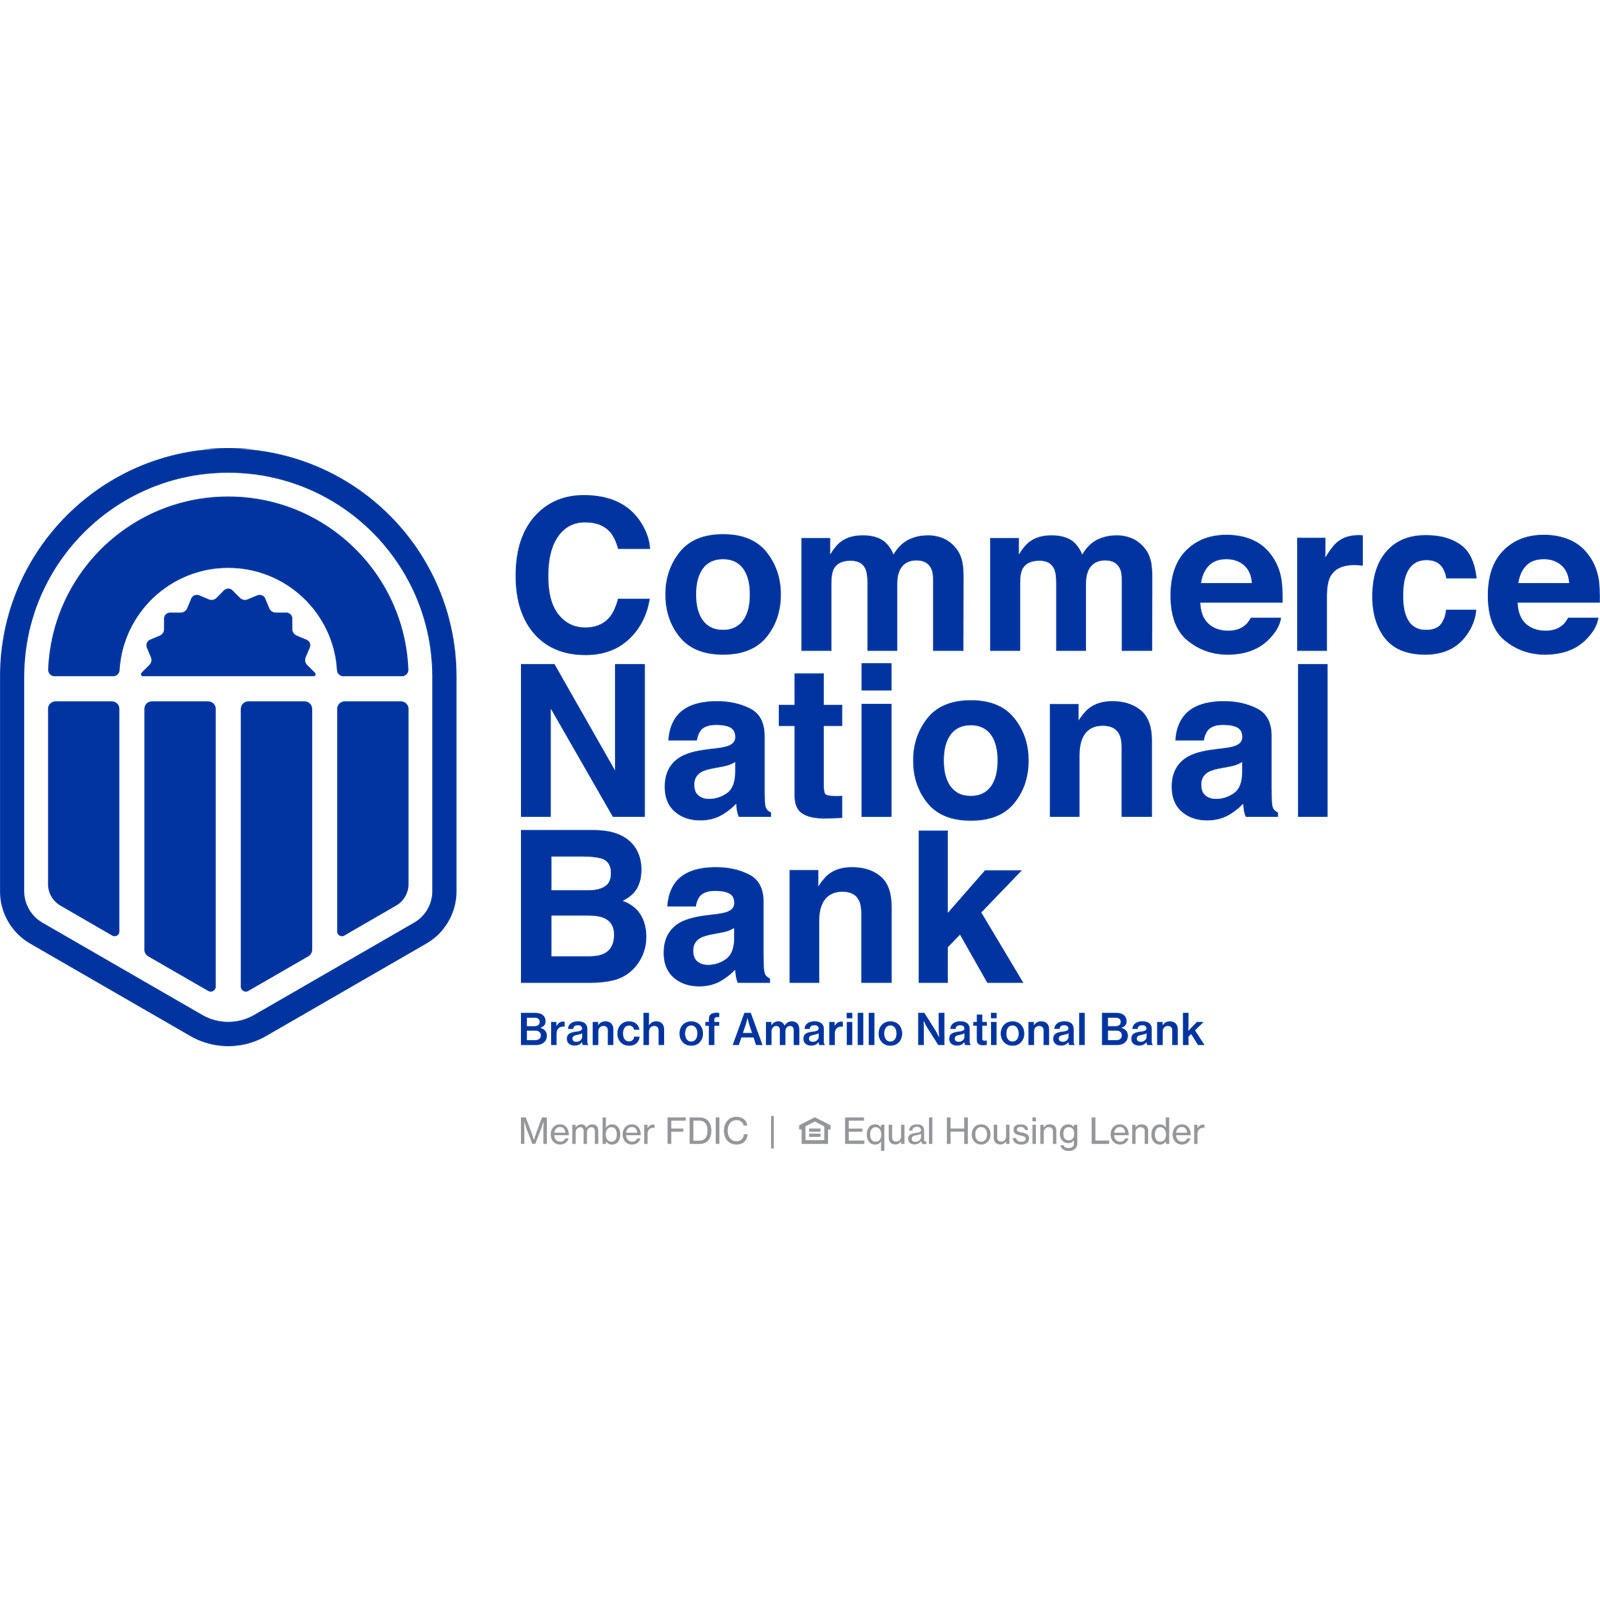 Commerce National Bank